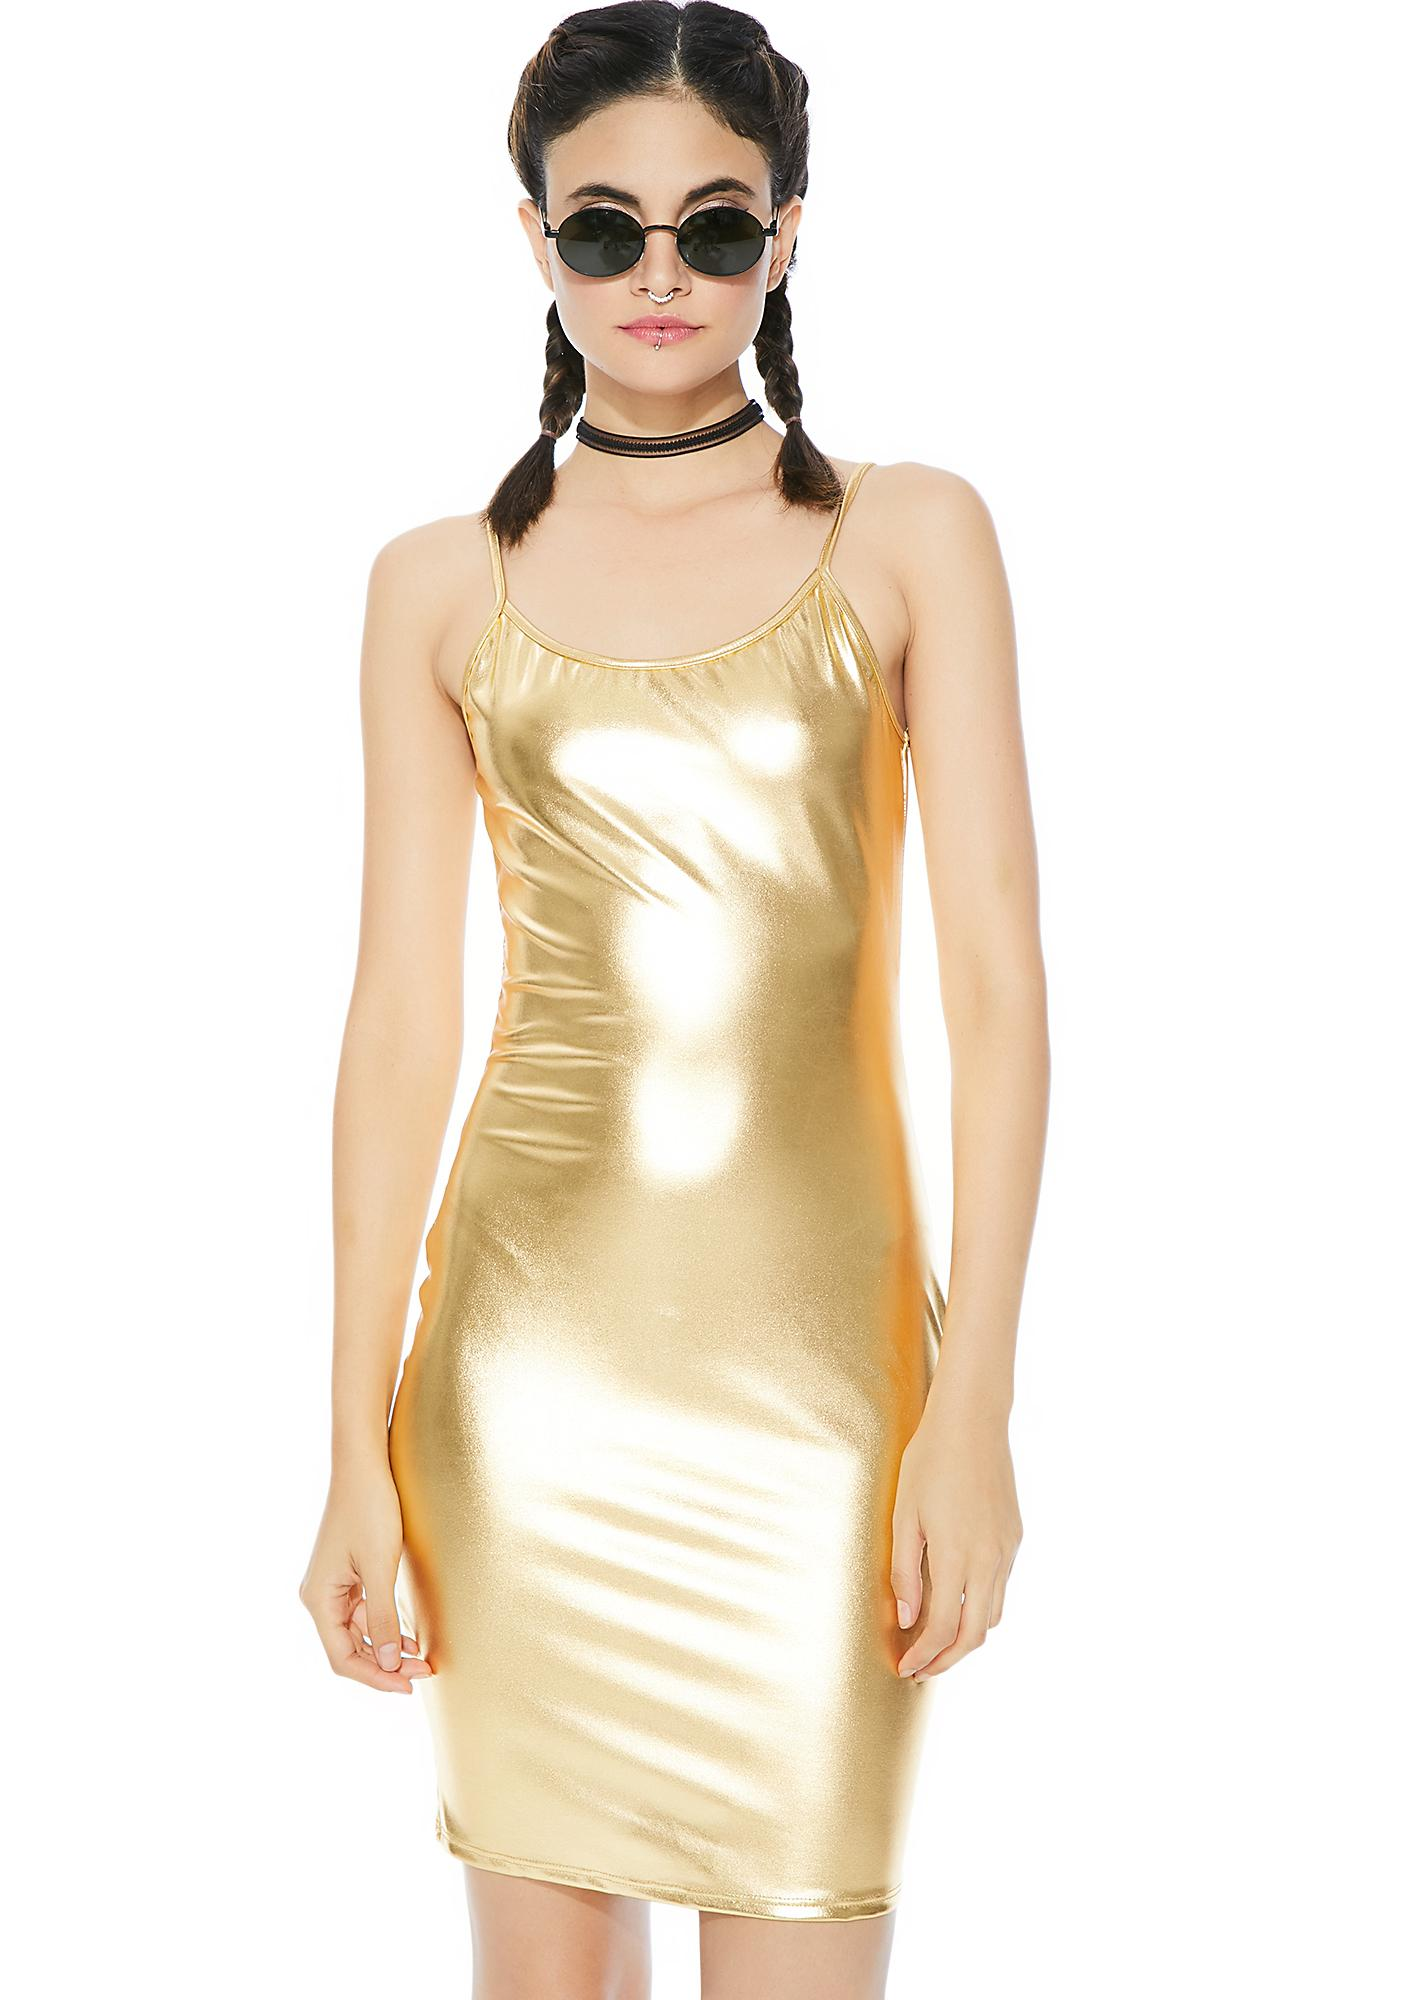 Midas Touch Mini Dress